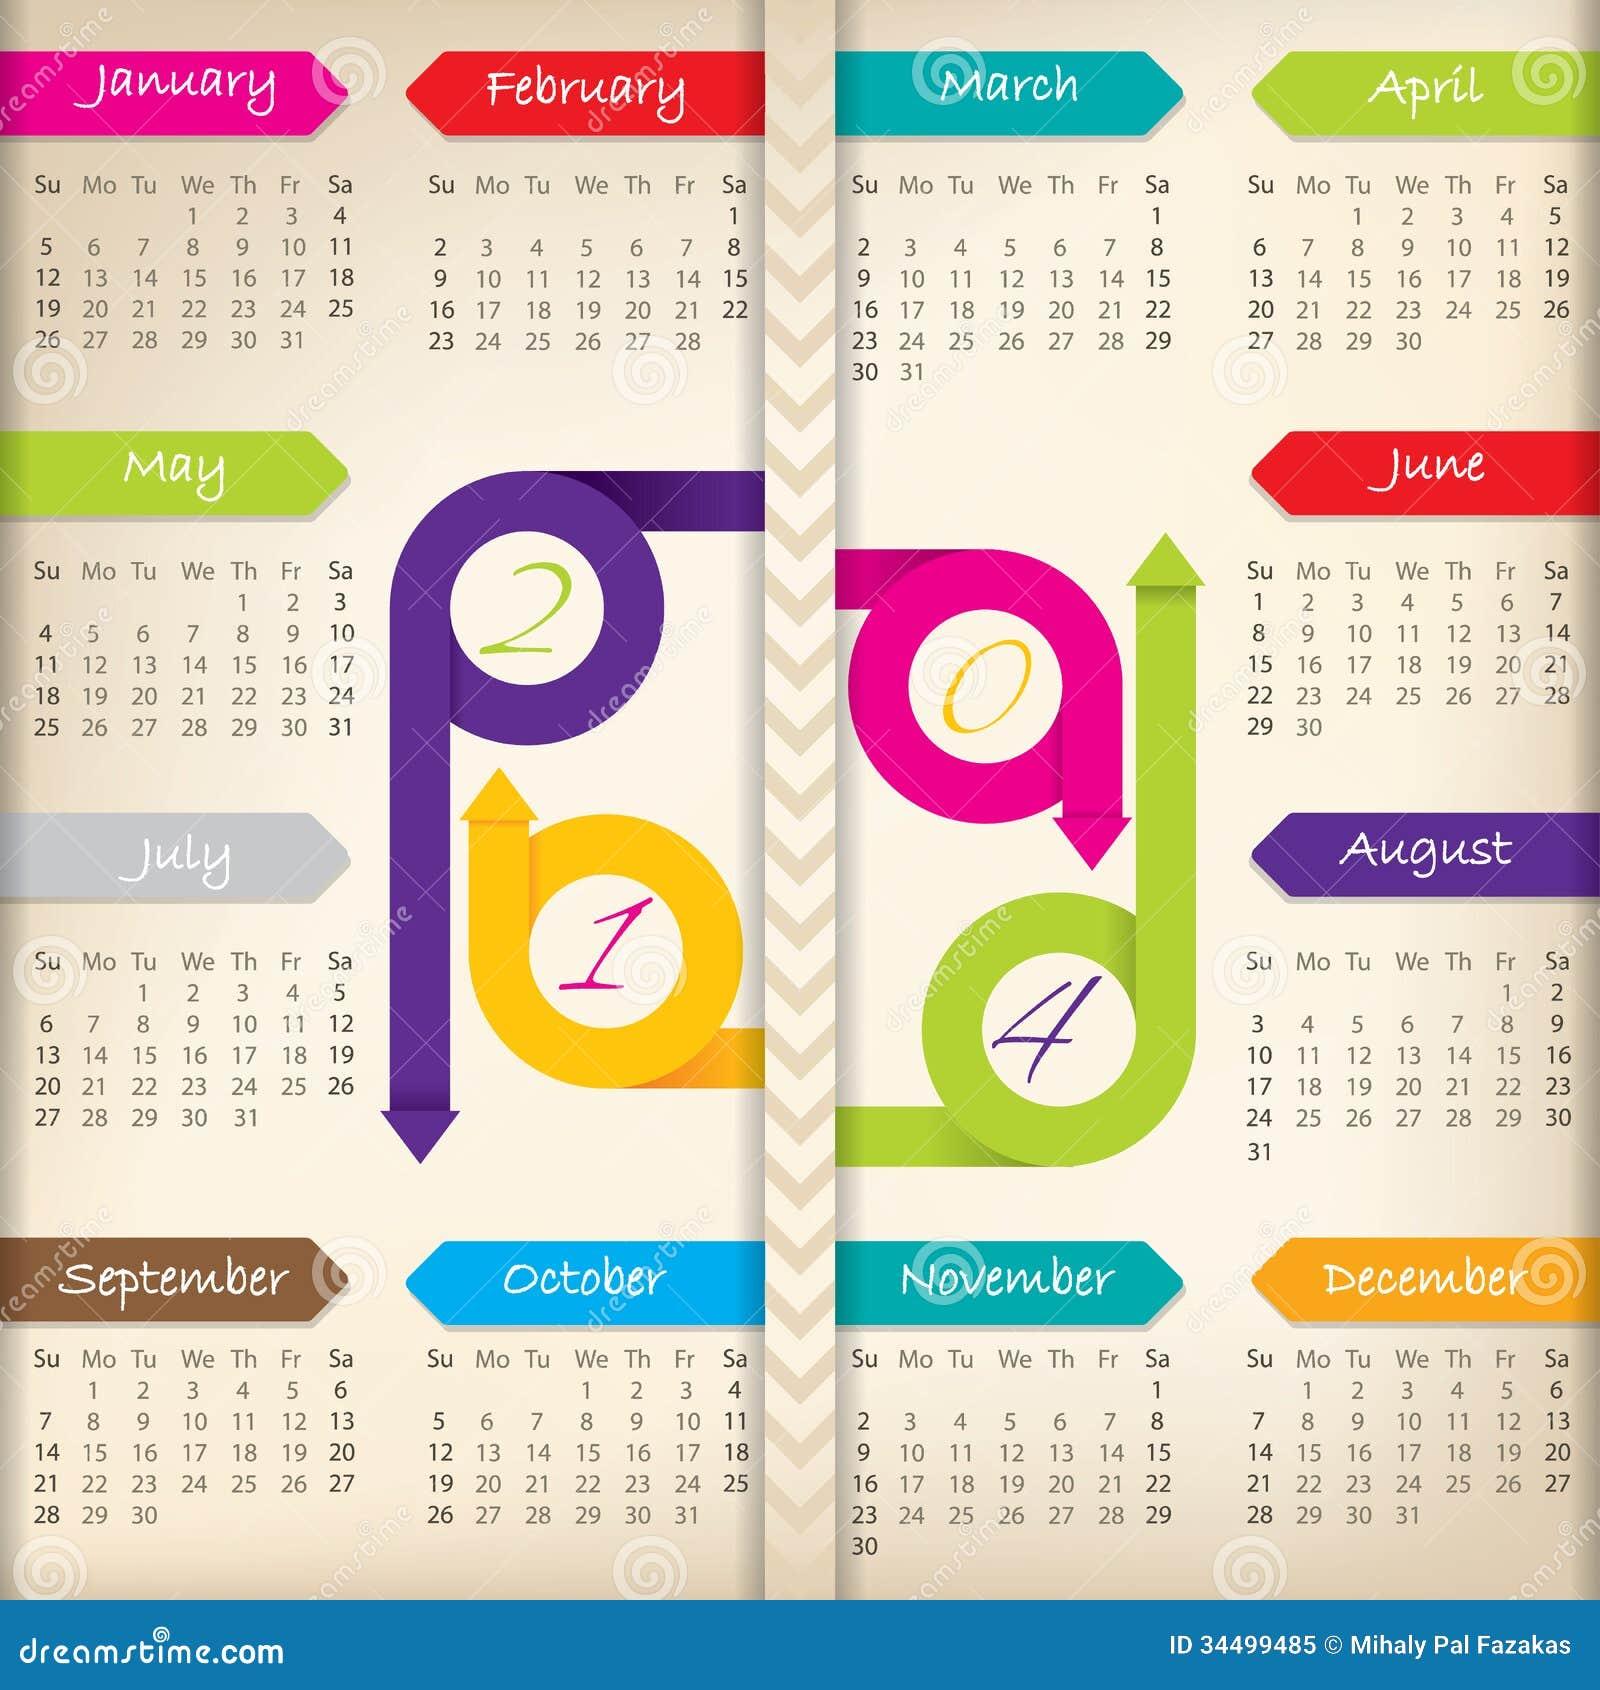 Calendar Ribbon Design : Calendar with color arrow ribbons stock vector